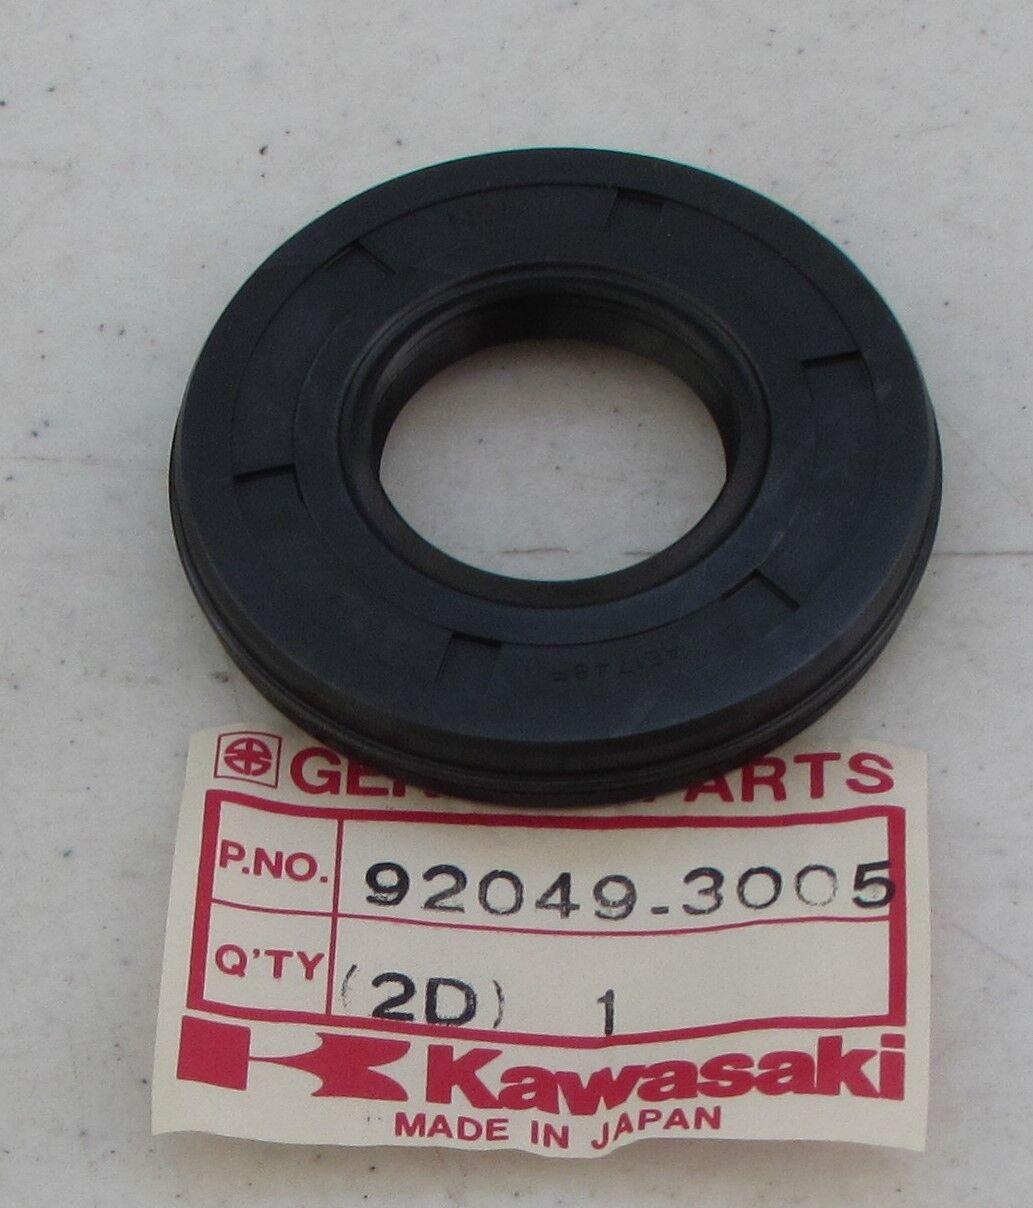 Kawasaki Crankshaft Oil Seal TCY306210 for JS550 JS440 JetSki 1986-1995